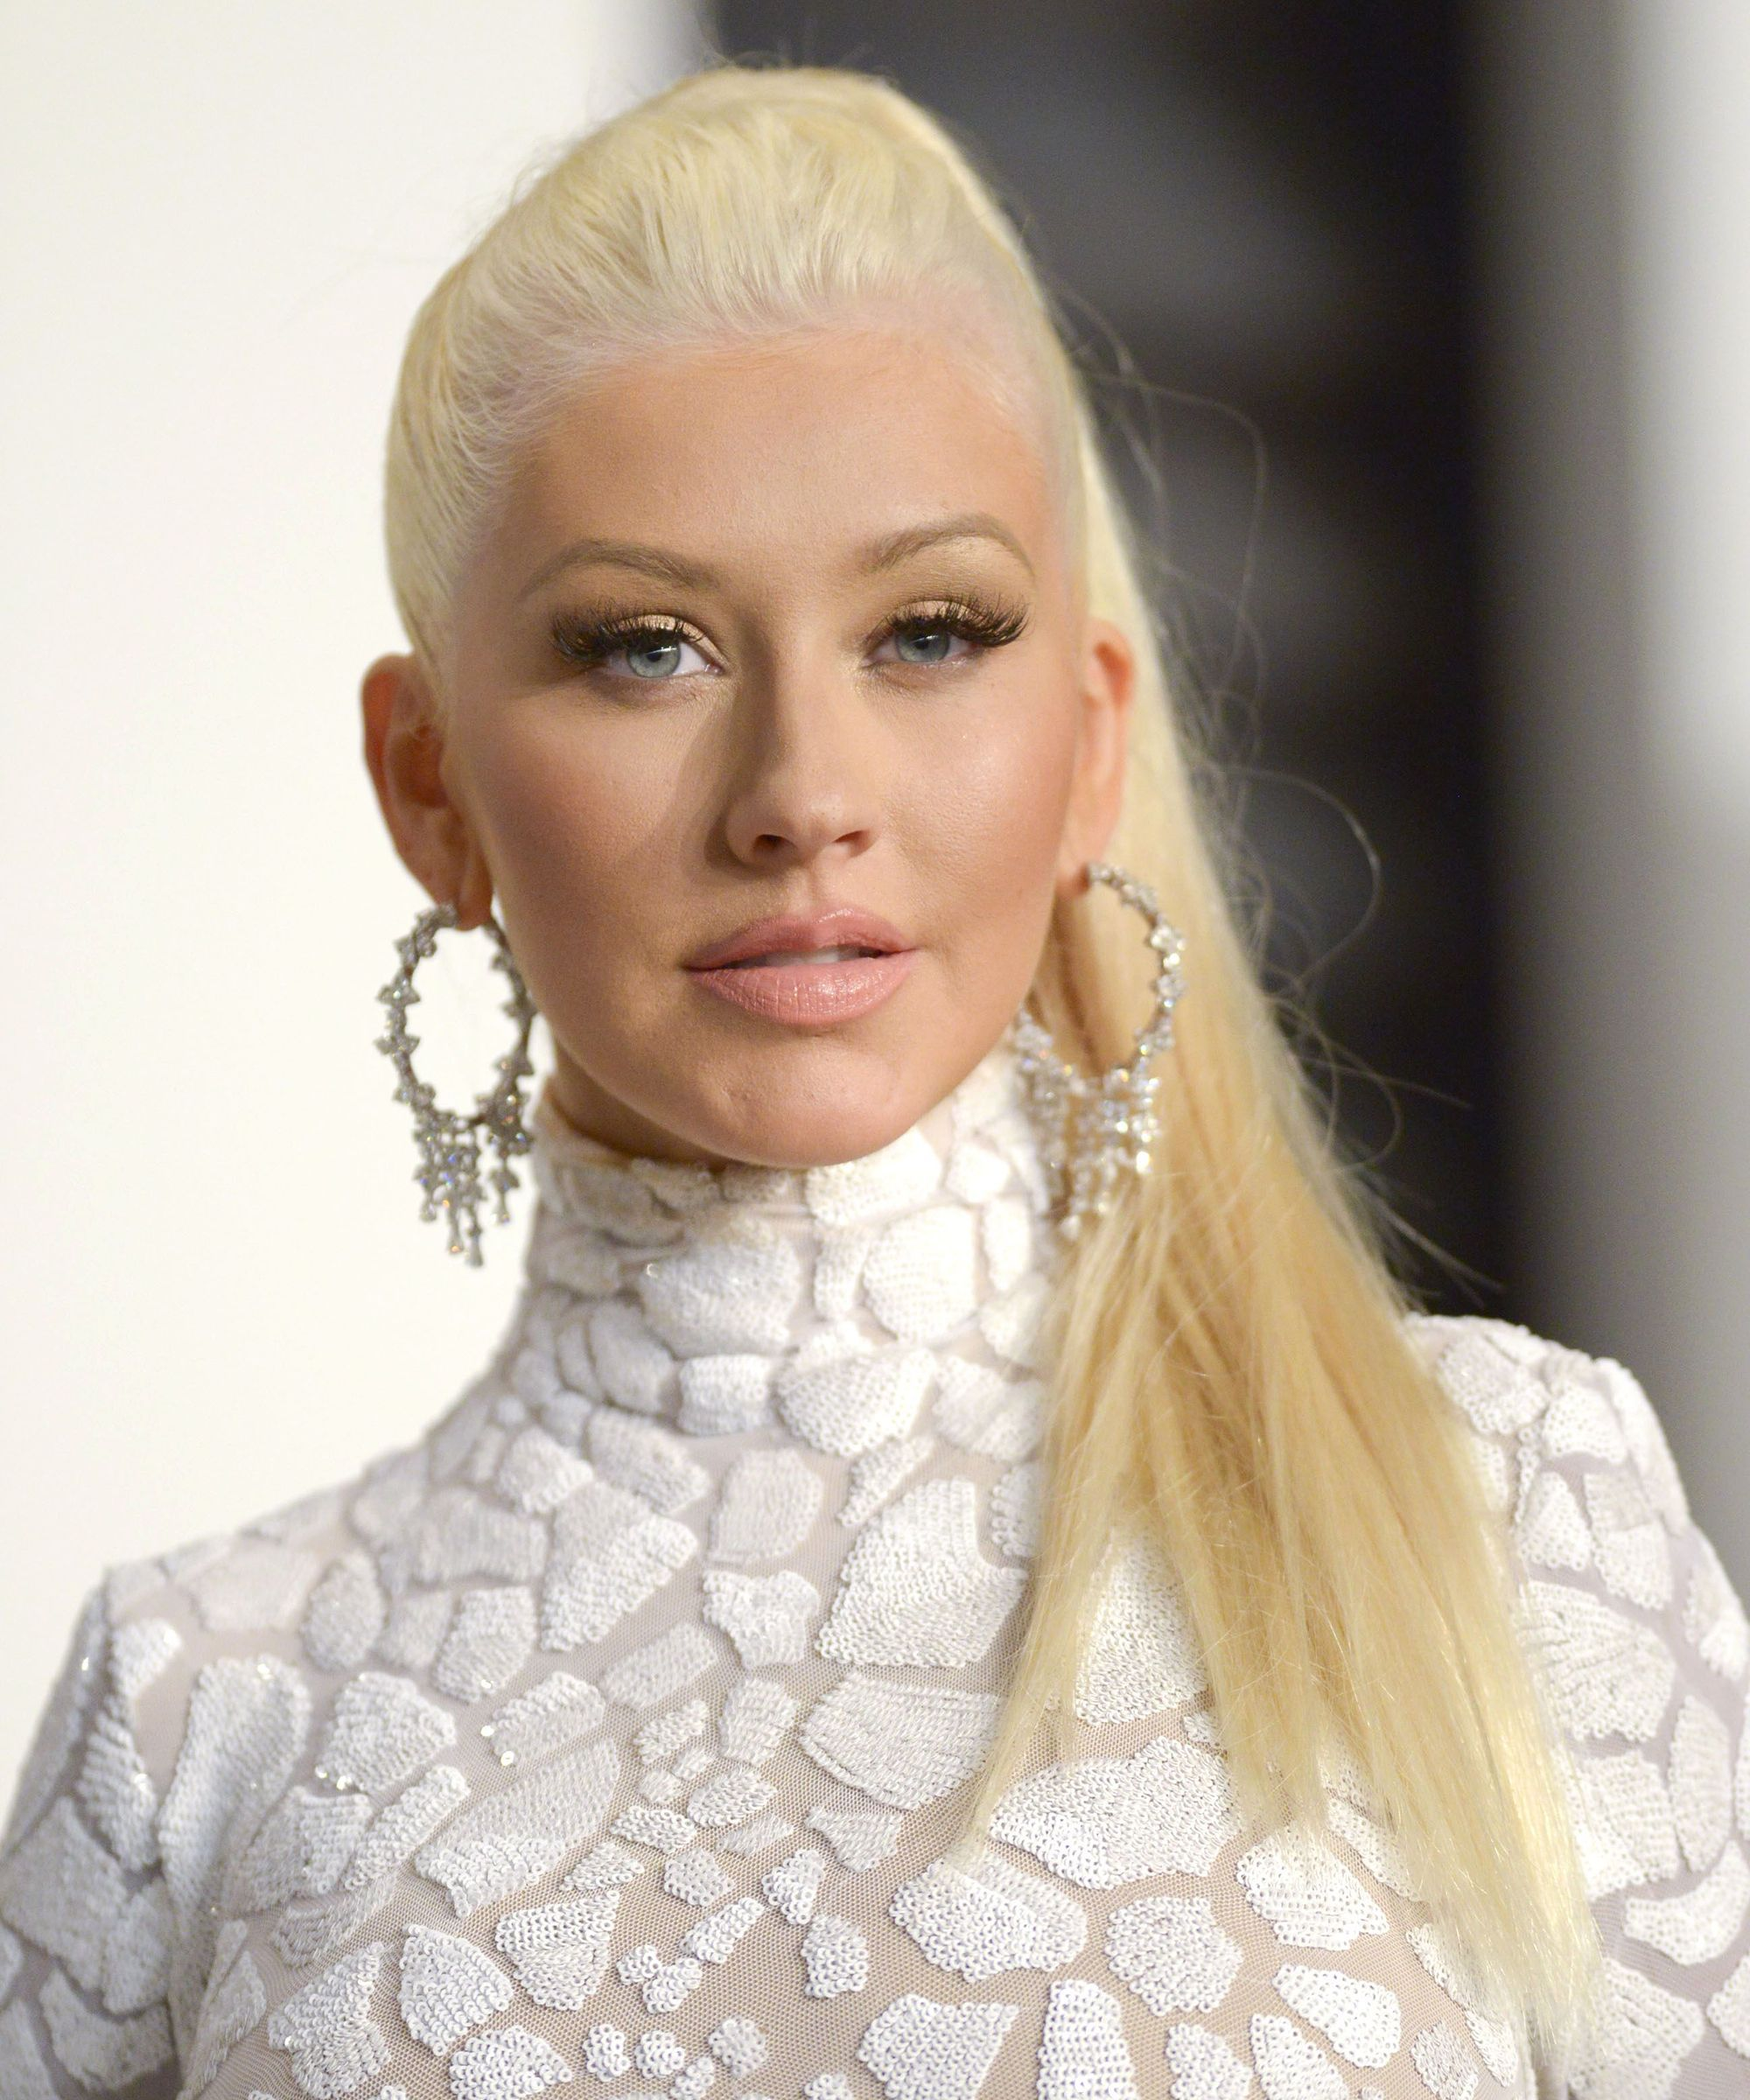 Christina Aguilera Nailed These Adele & Rihanna Impersonations https://www.bloglovin.com/blog/post/194170/4874809619 via @bloglovin